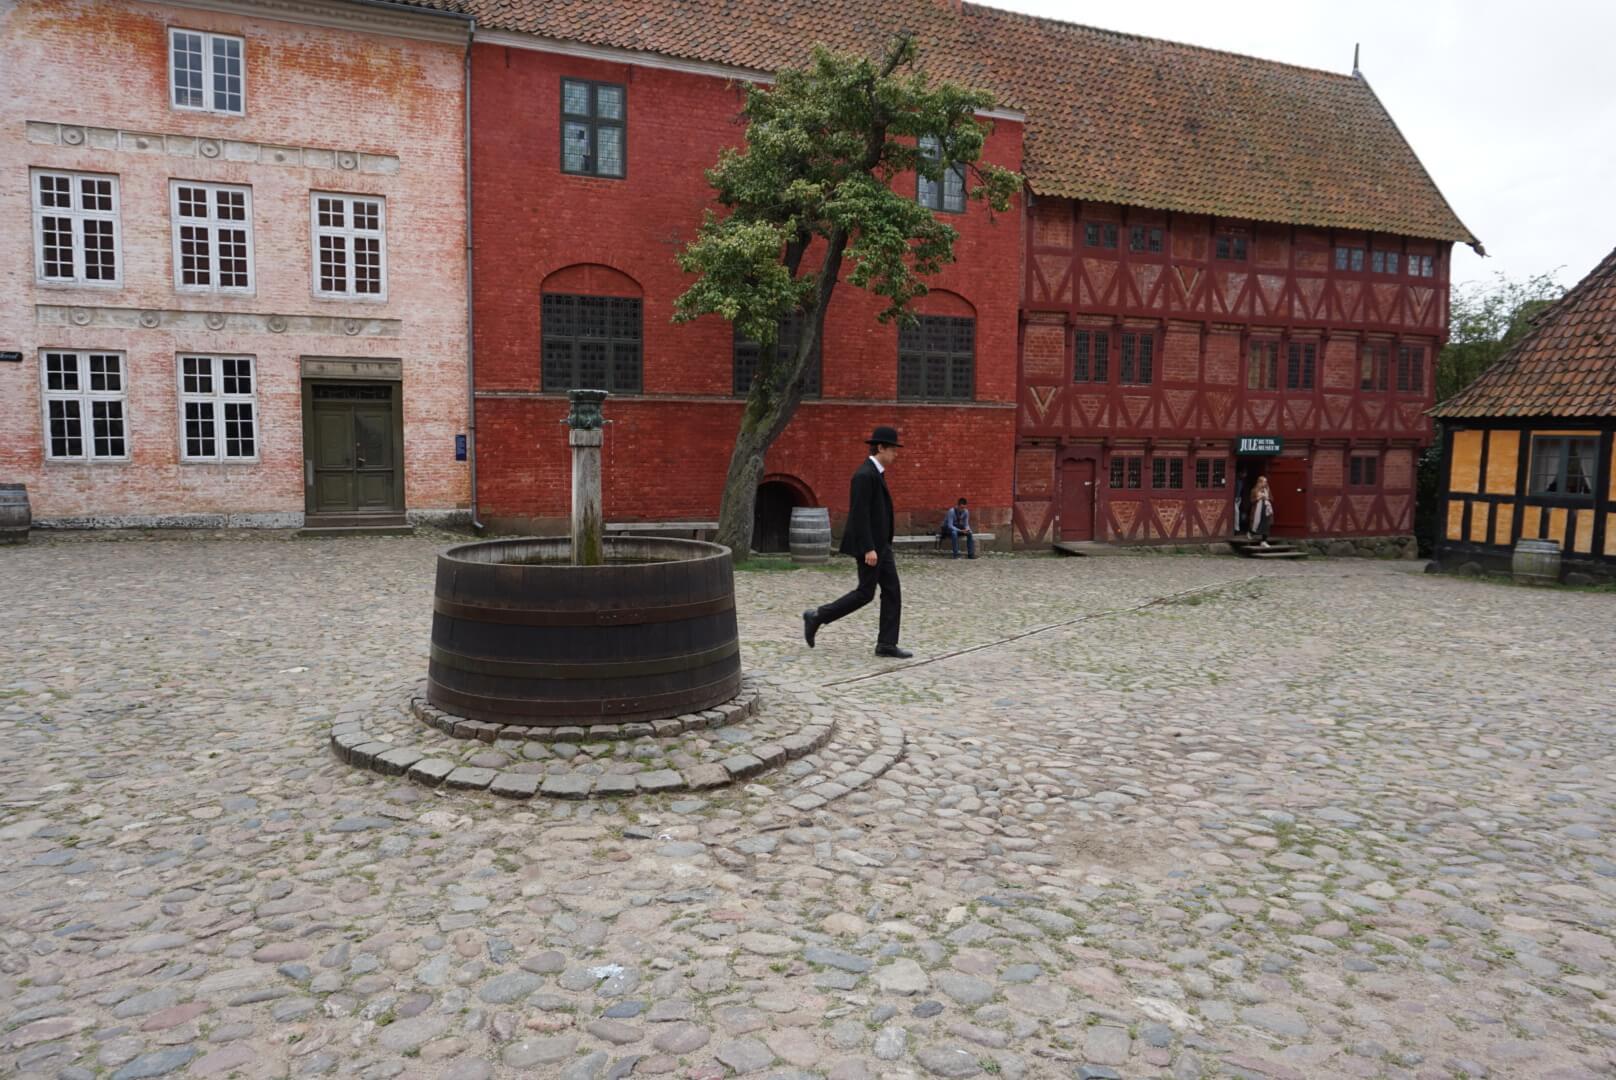 Aarhus VIAGGIO IN DANIMARCA CON BAMBINI